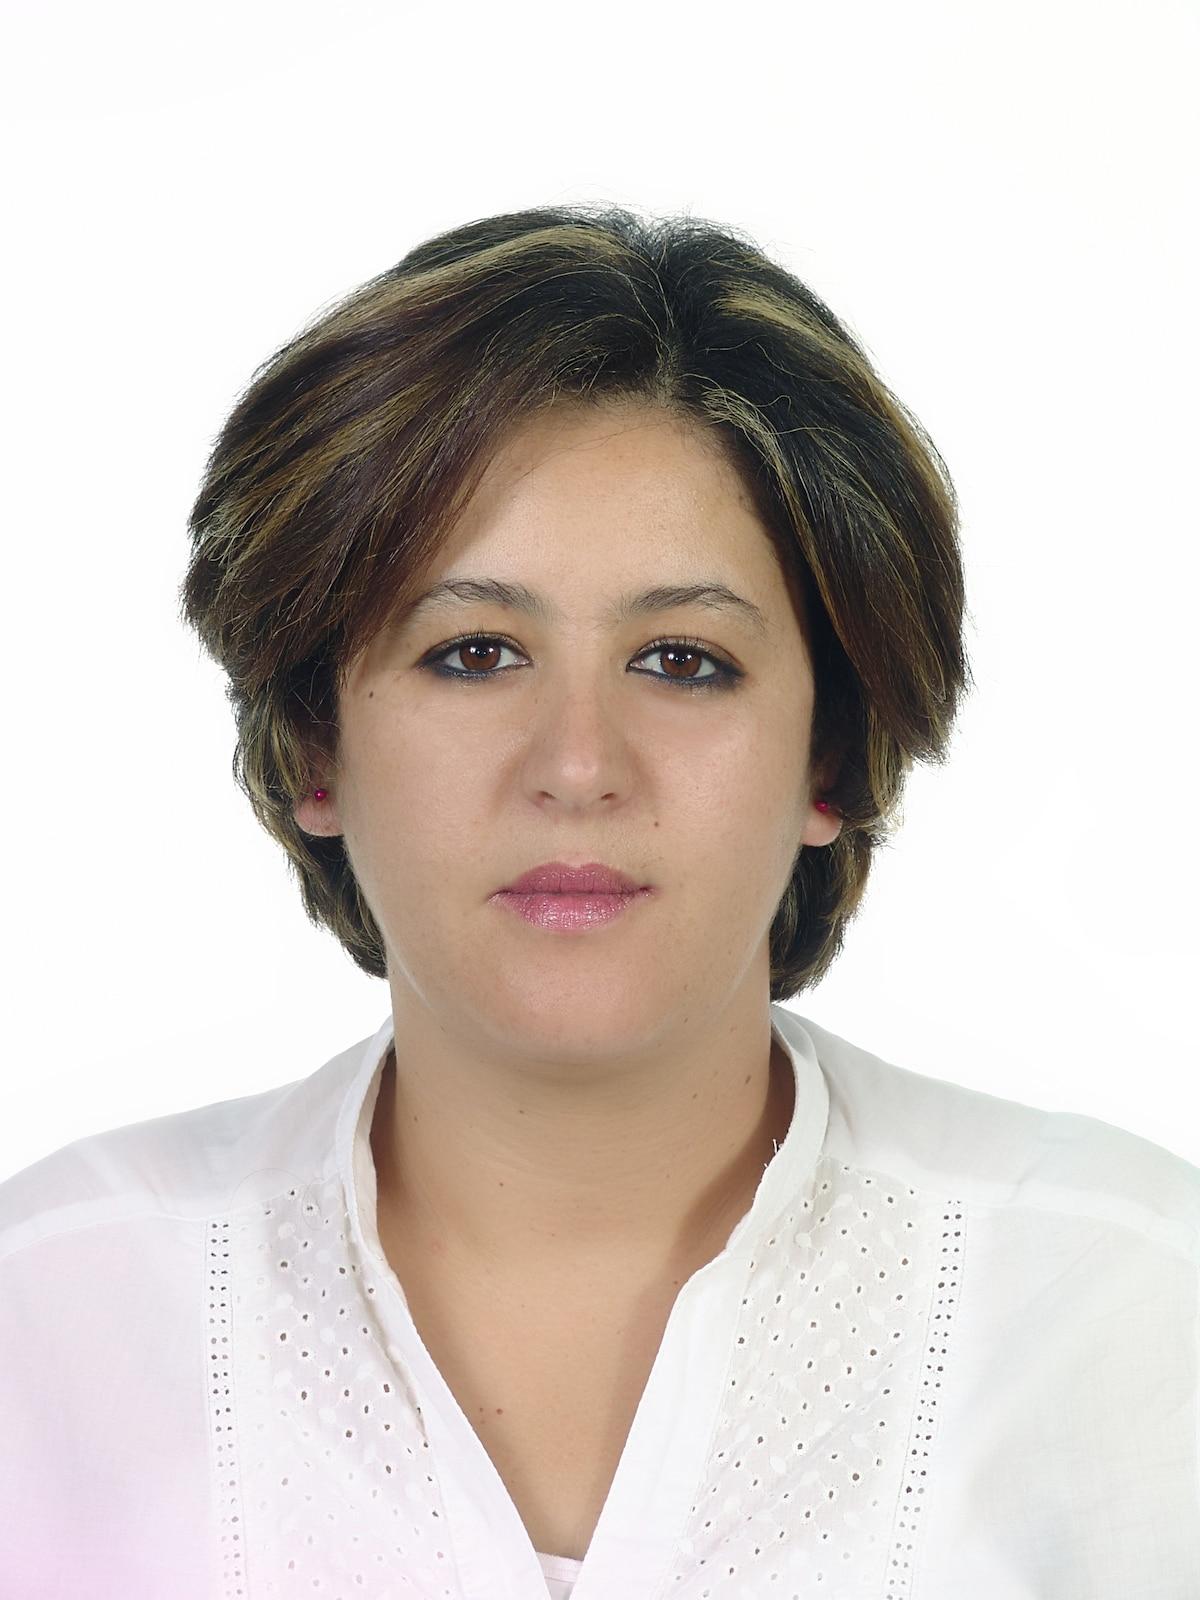 Fatima from Chefchaouen